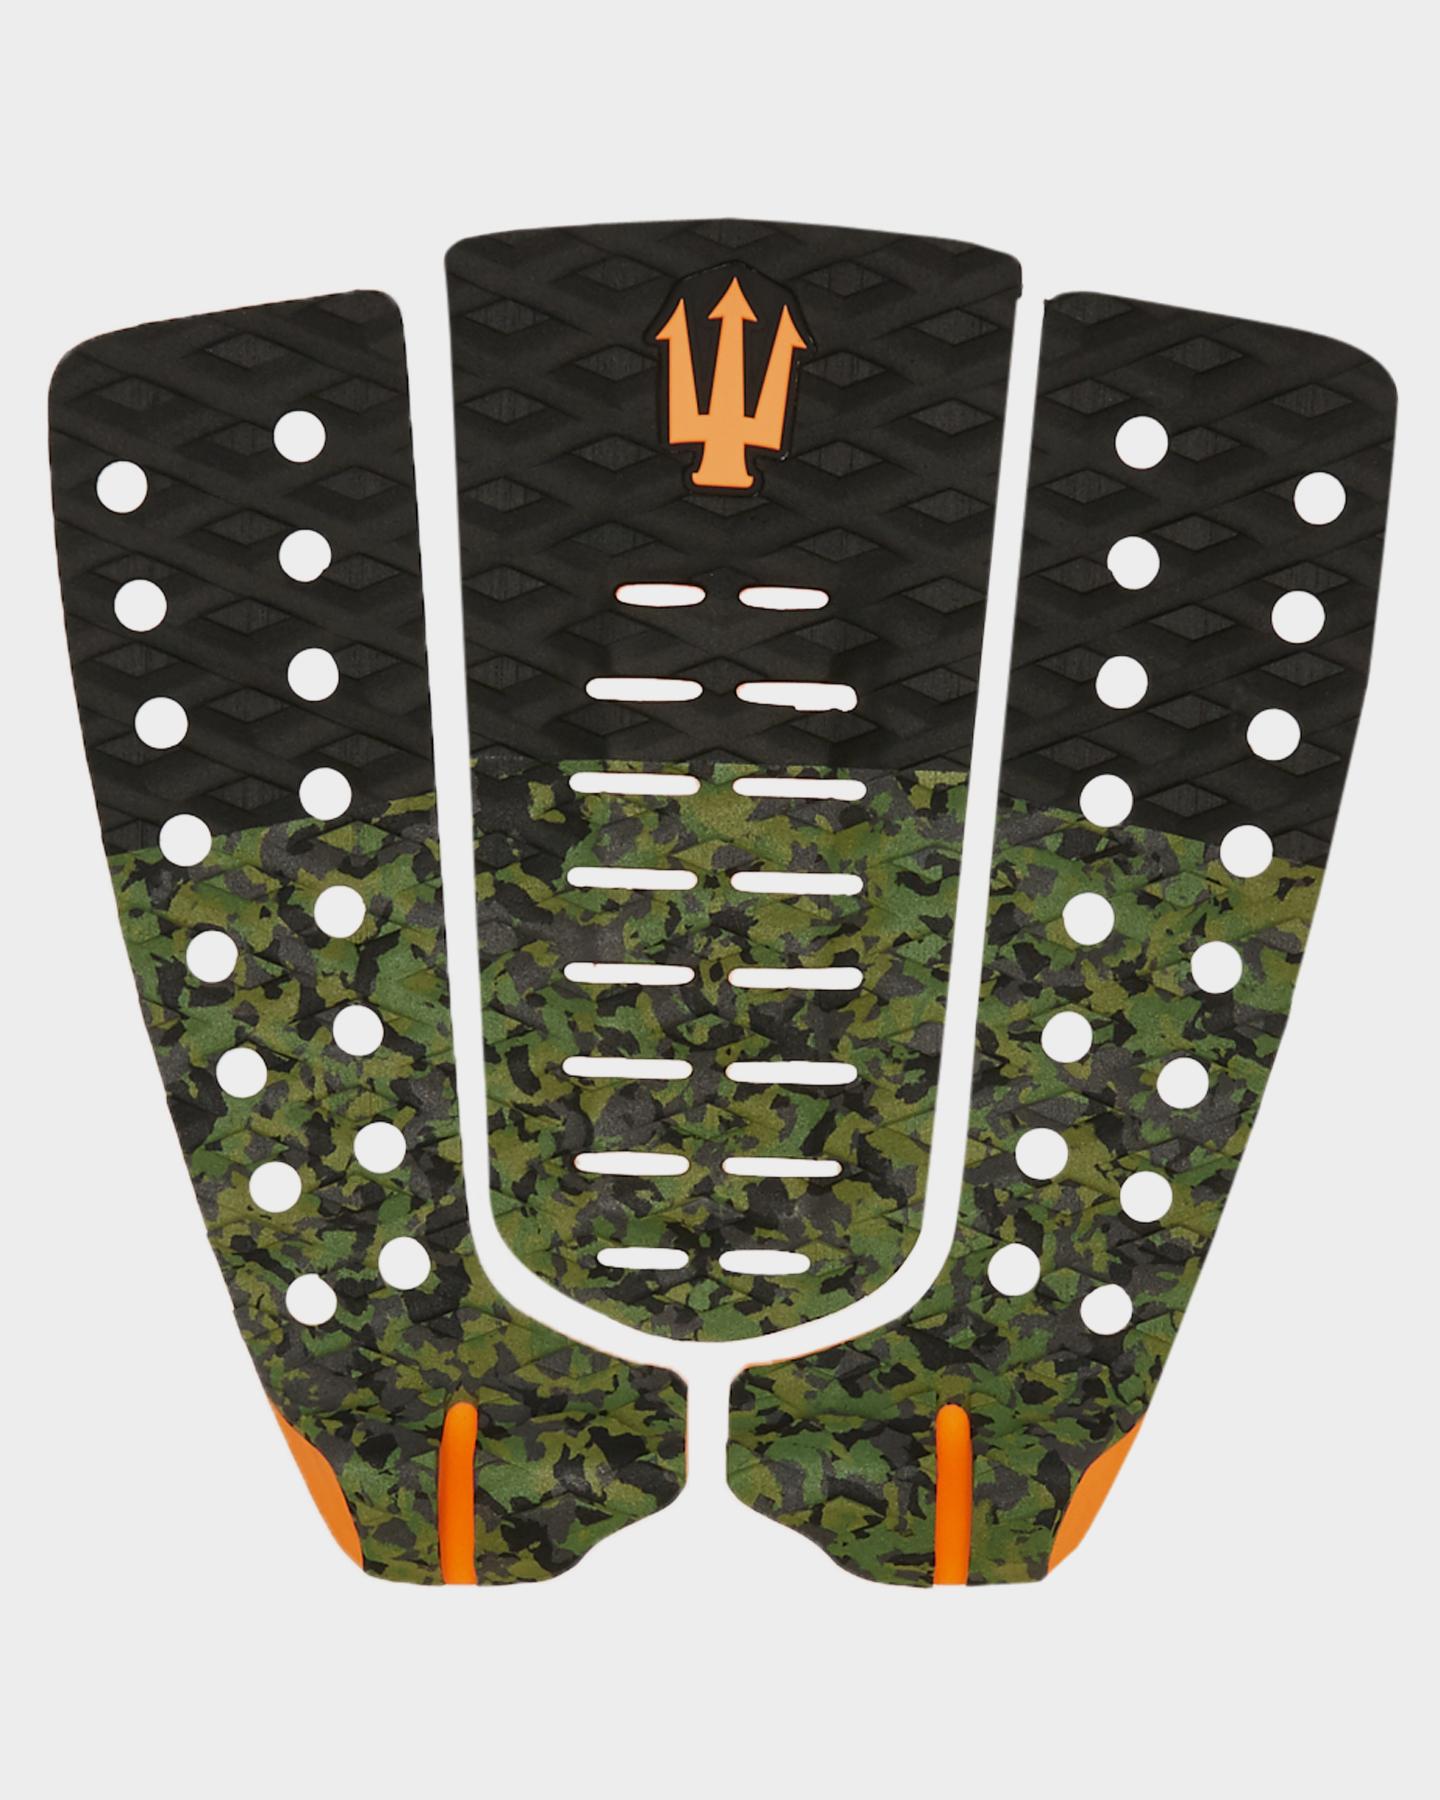 Fk Surf Tone 2 Tail Pad Camo Black Orange Camo Black Orange